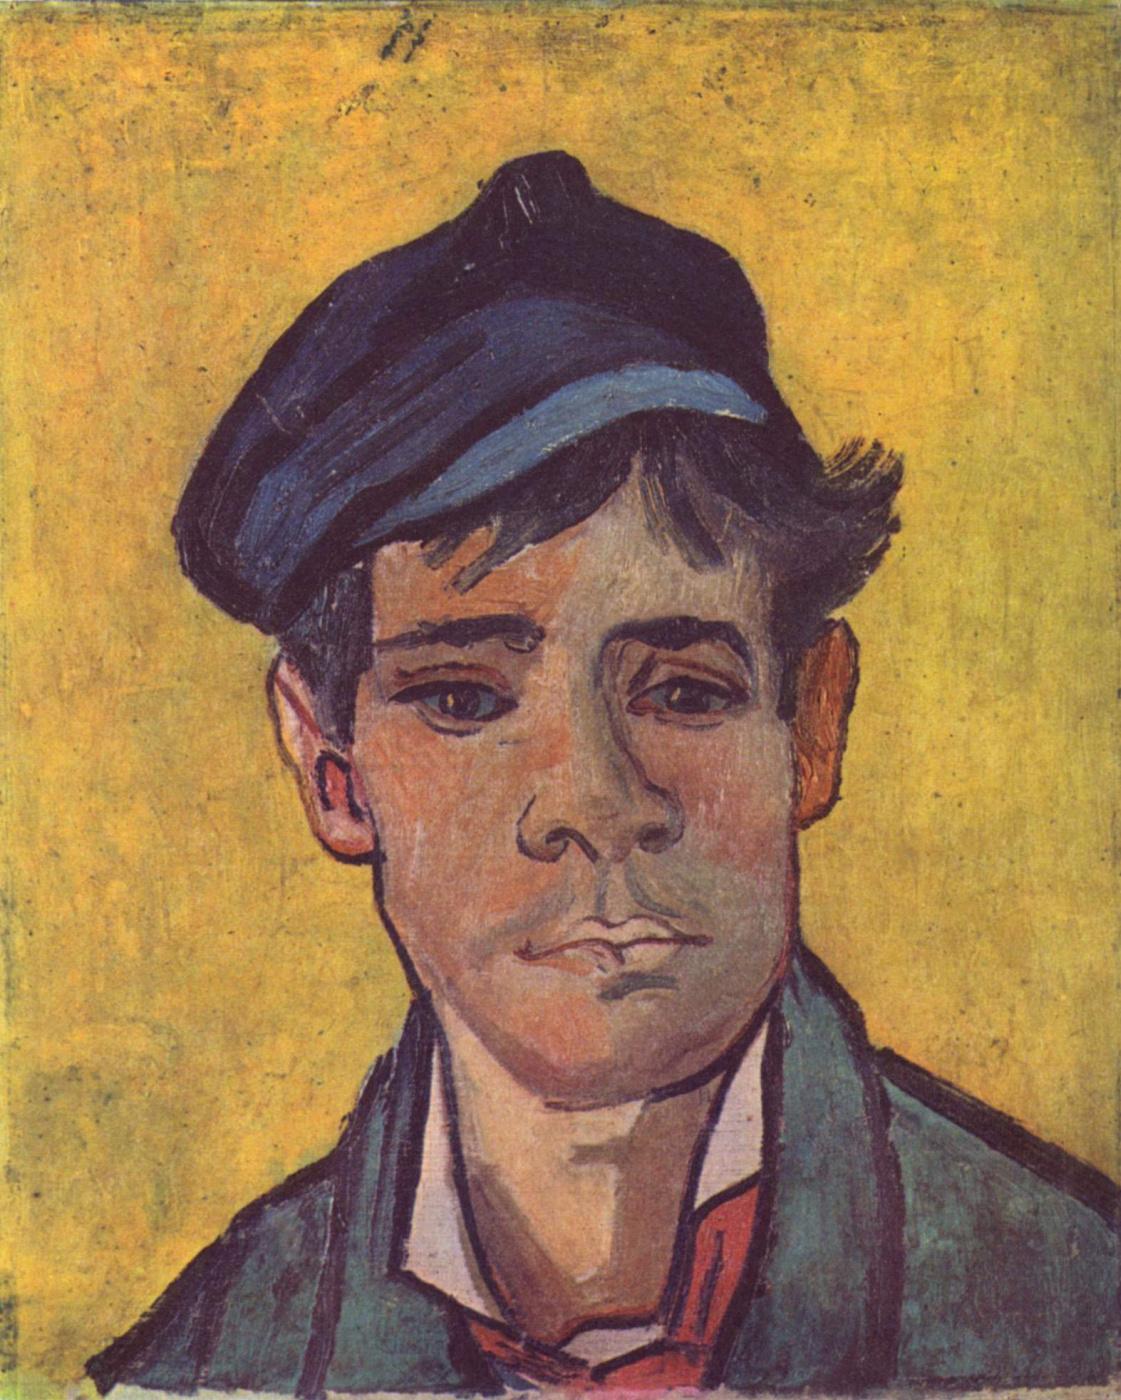 Vincent van Gogh. Young man in hat